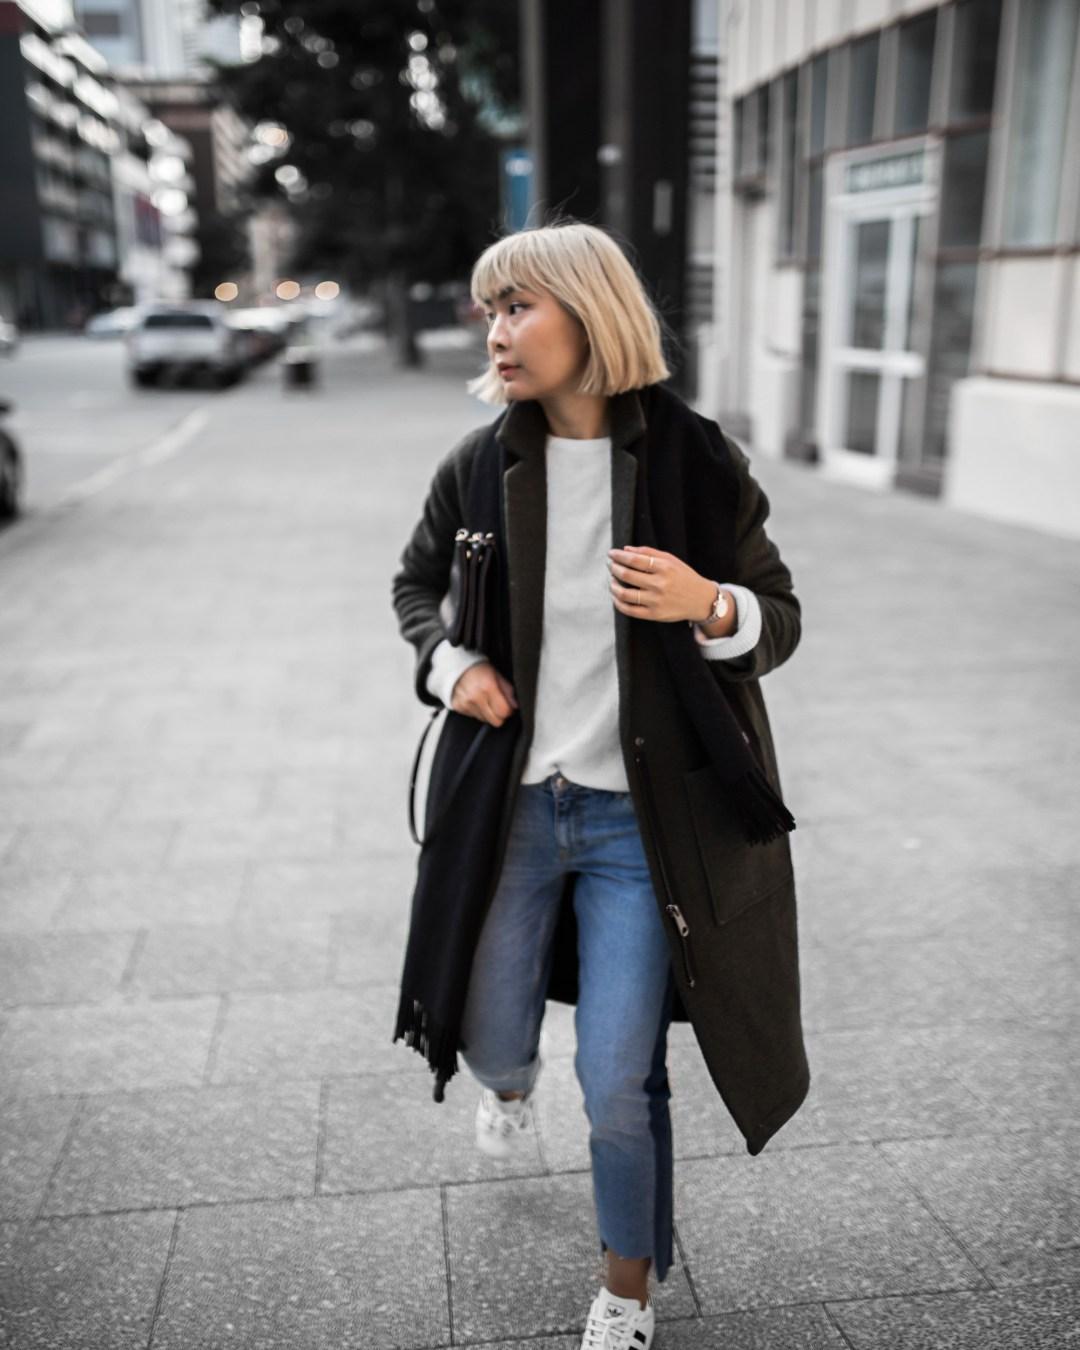 acne-scarf-khaki-coat-stepped-hem-jeans-outfit-inspiration-4-copy